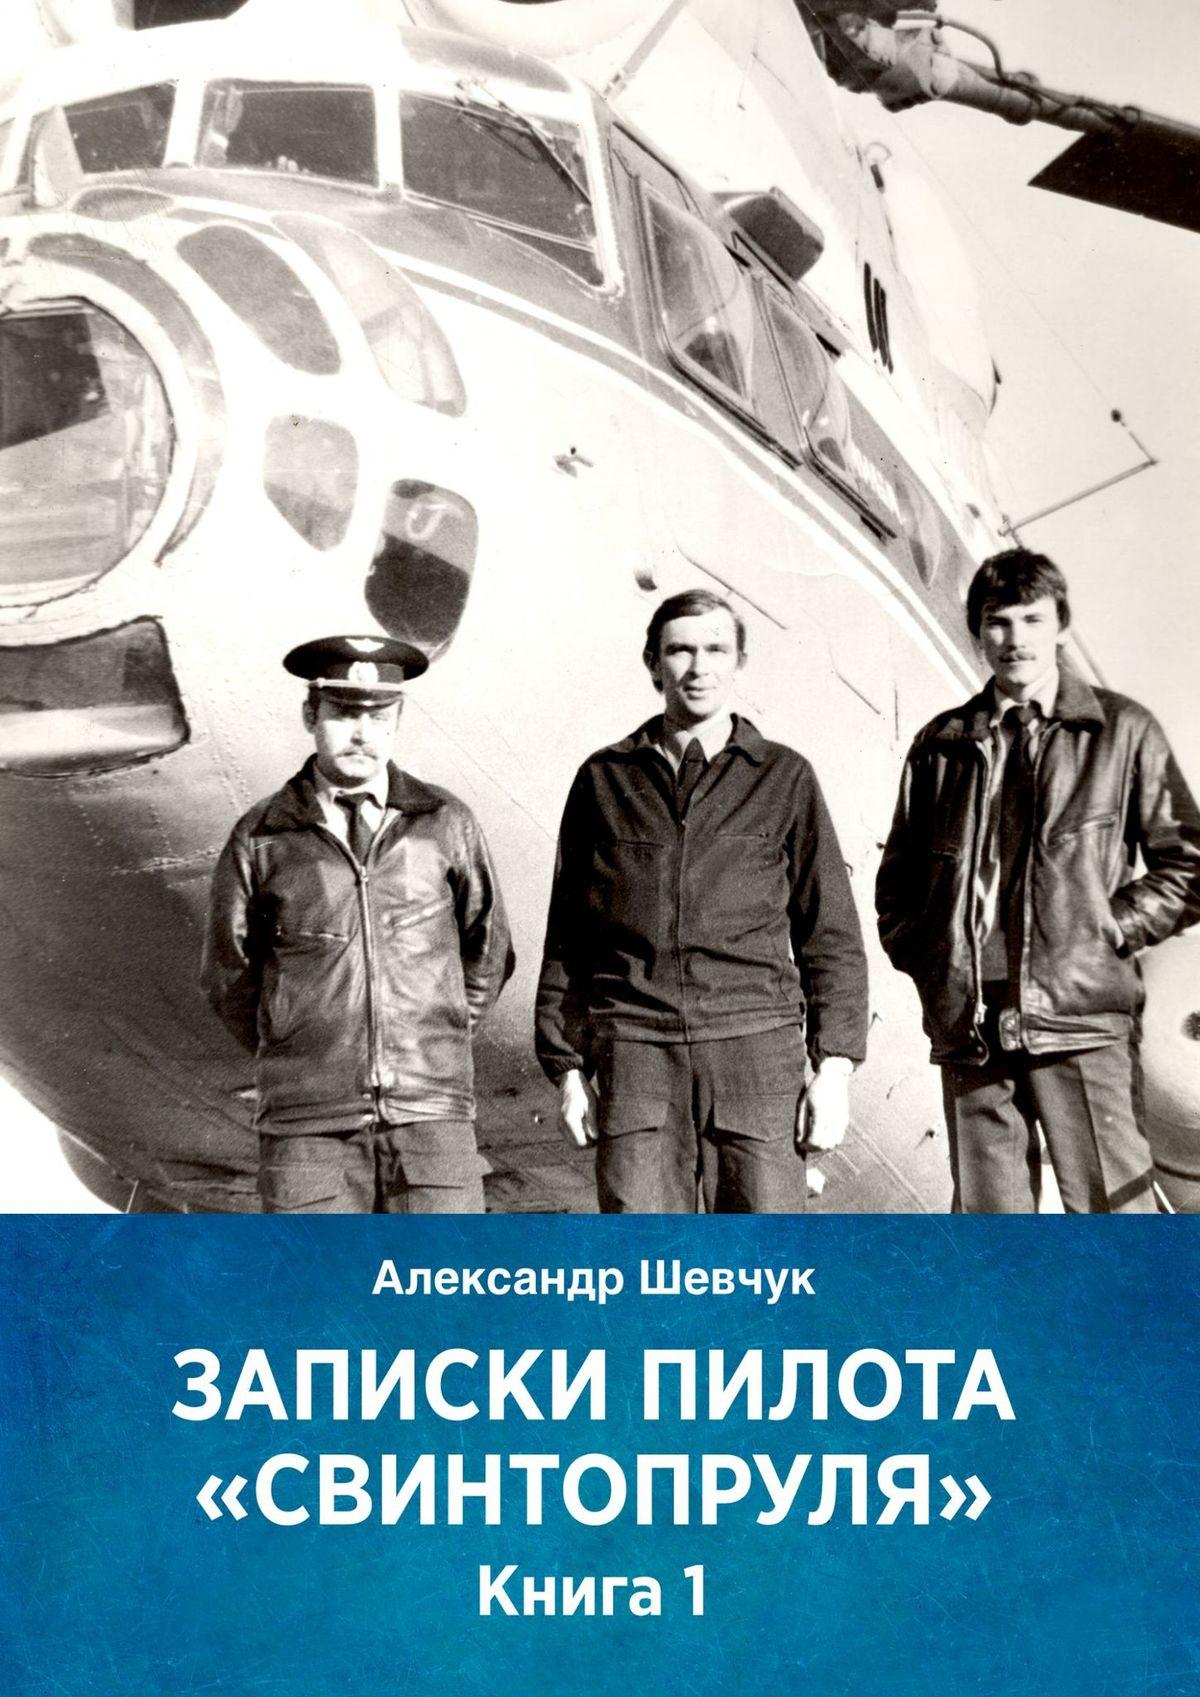 Александр Шевчук Записки пилота «Свинтопруля». Книга 1